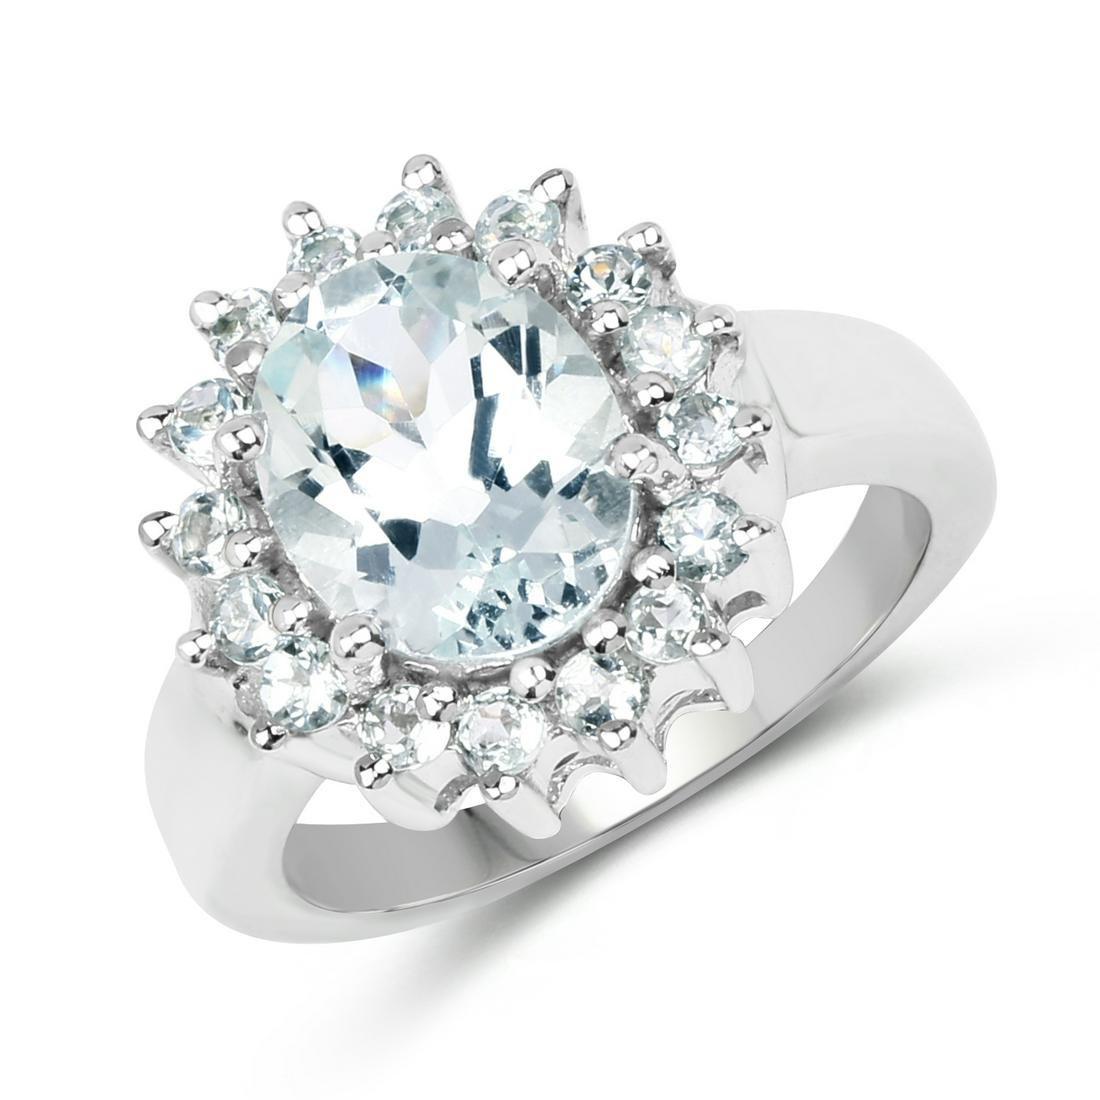 2.73 ctw Genuine Aquamarine .925 Sterling Silver Ring